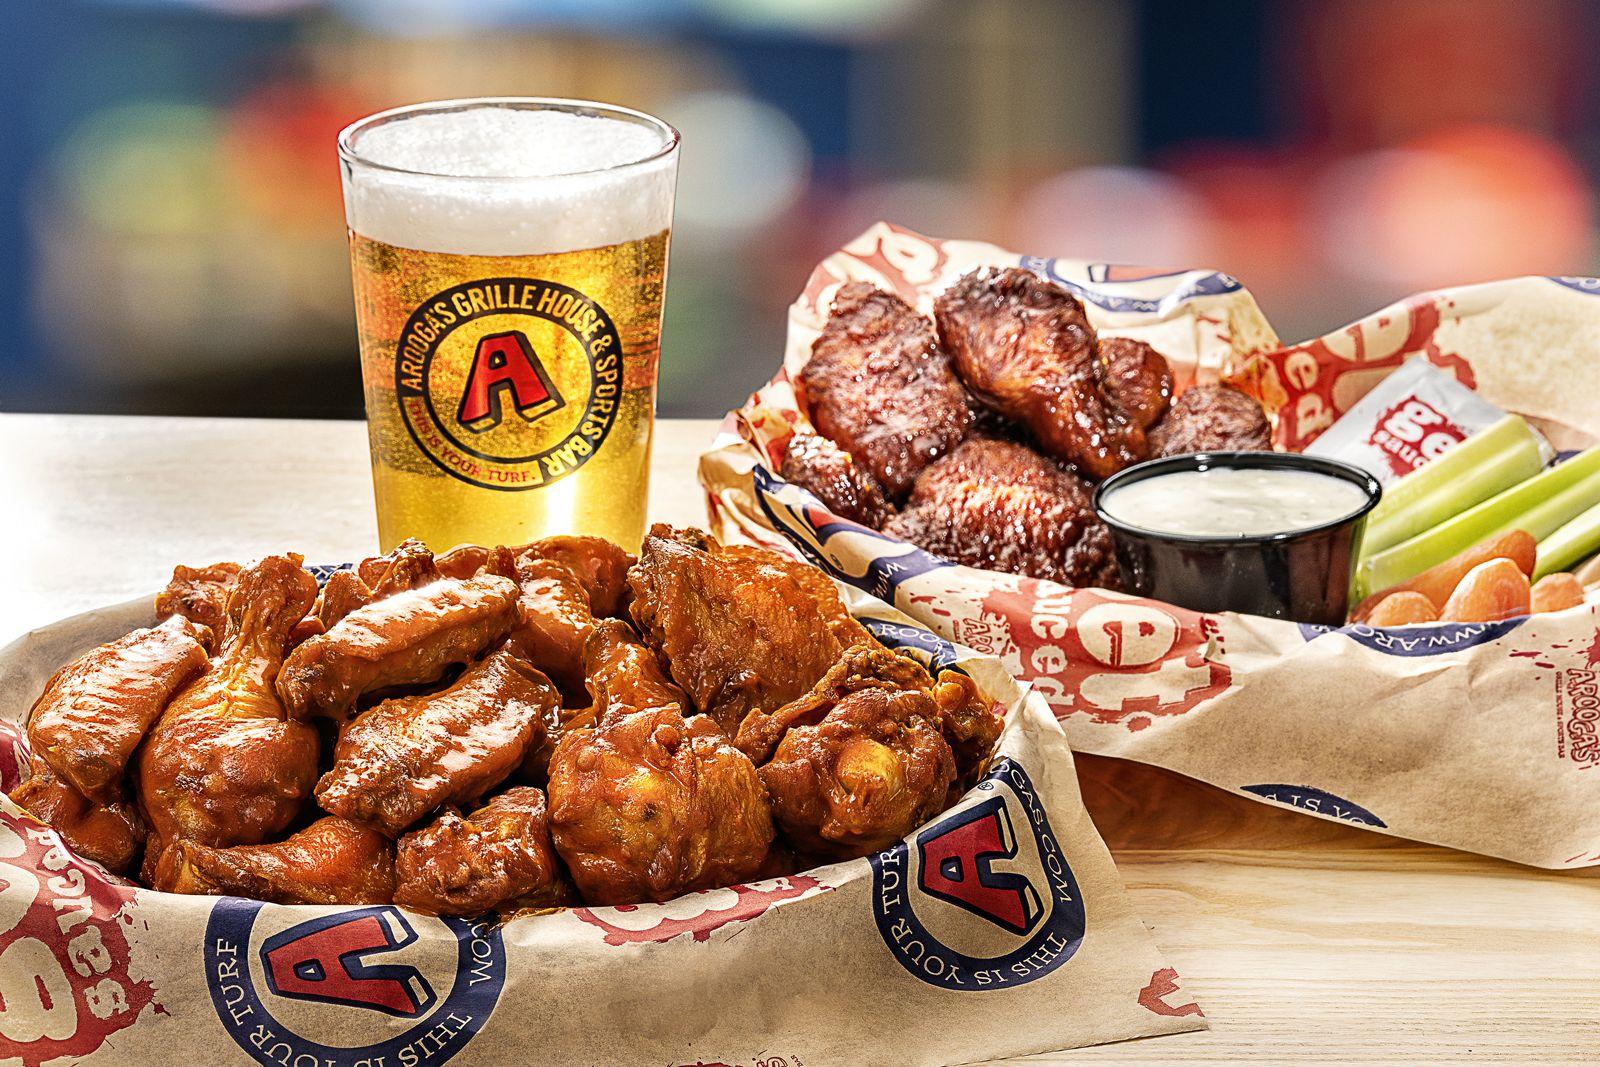 Arooga's Grille House & Sports Bar ouvrira ses portes à Attleboro, MA, le 22 août